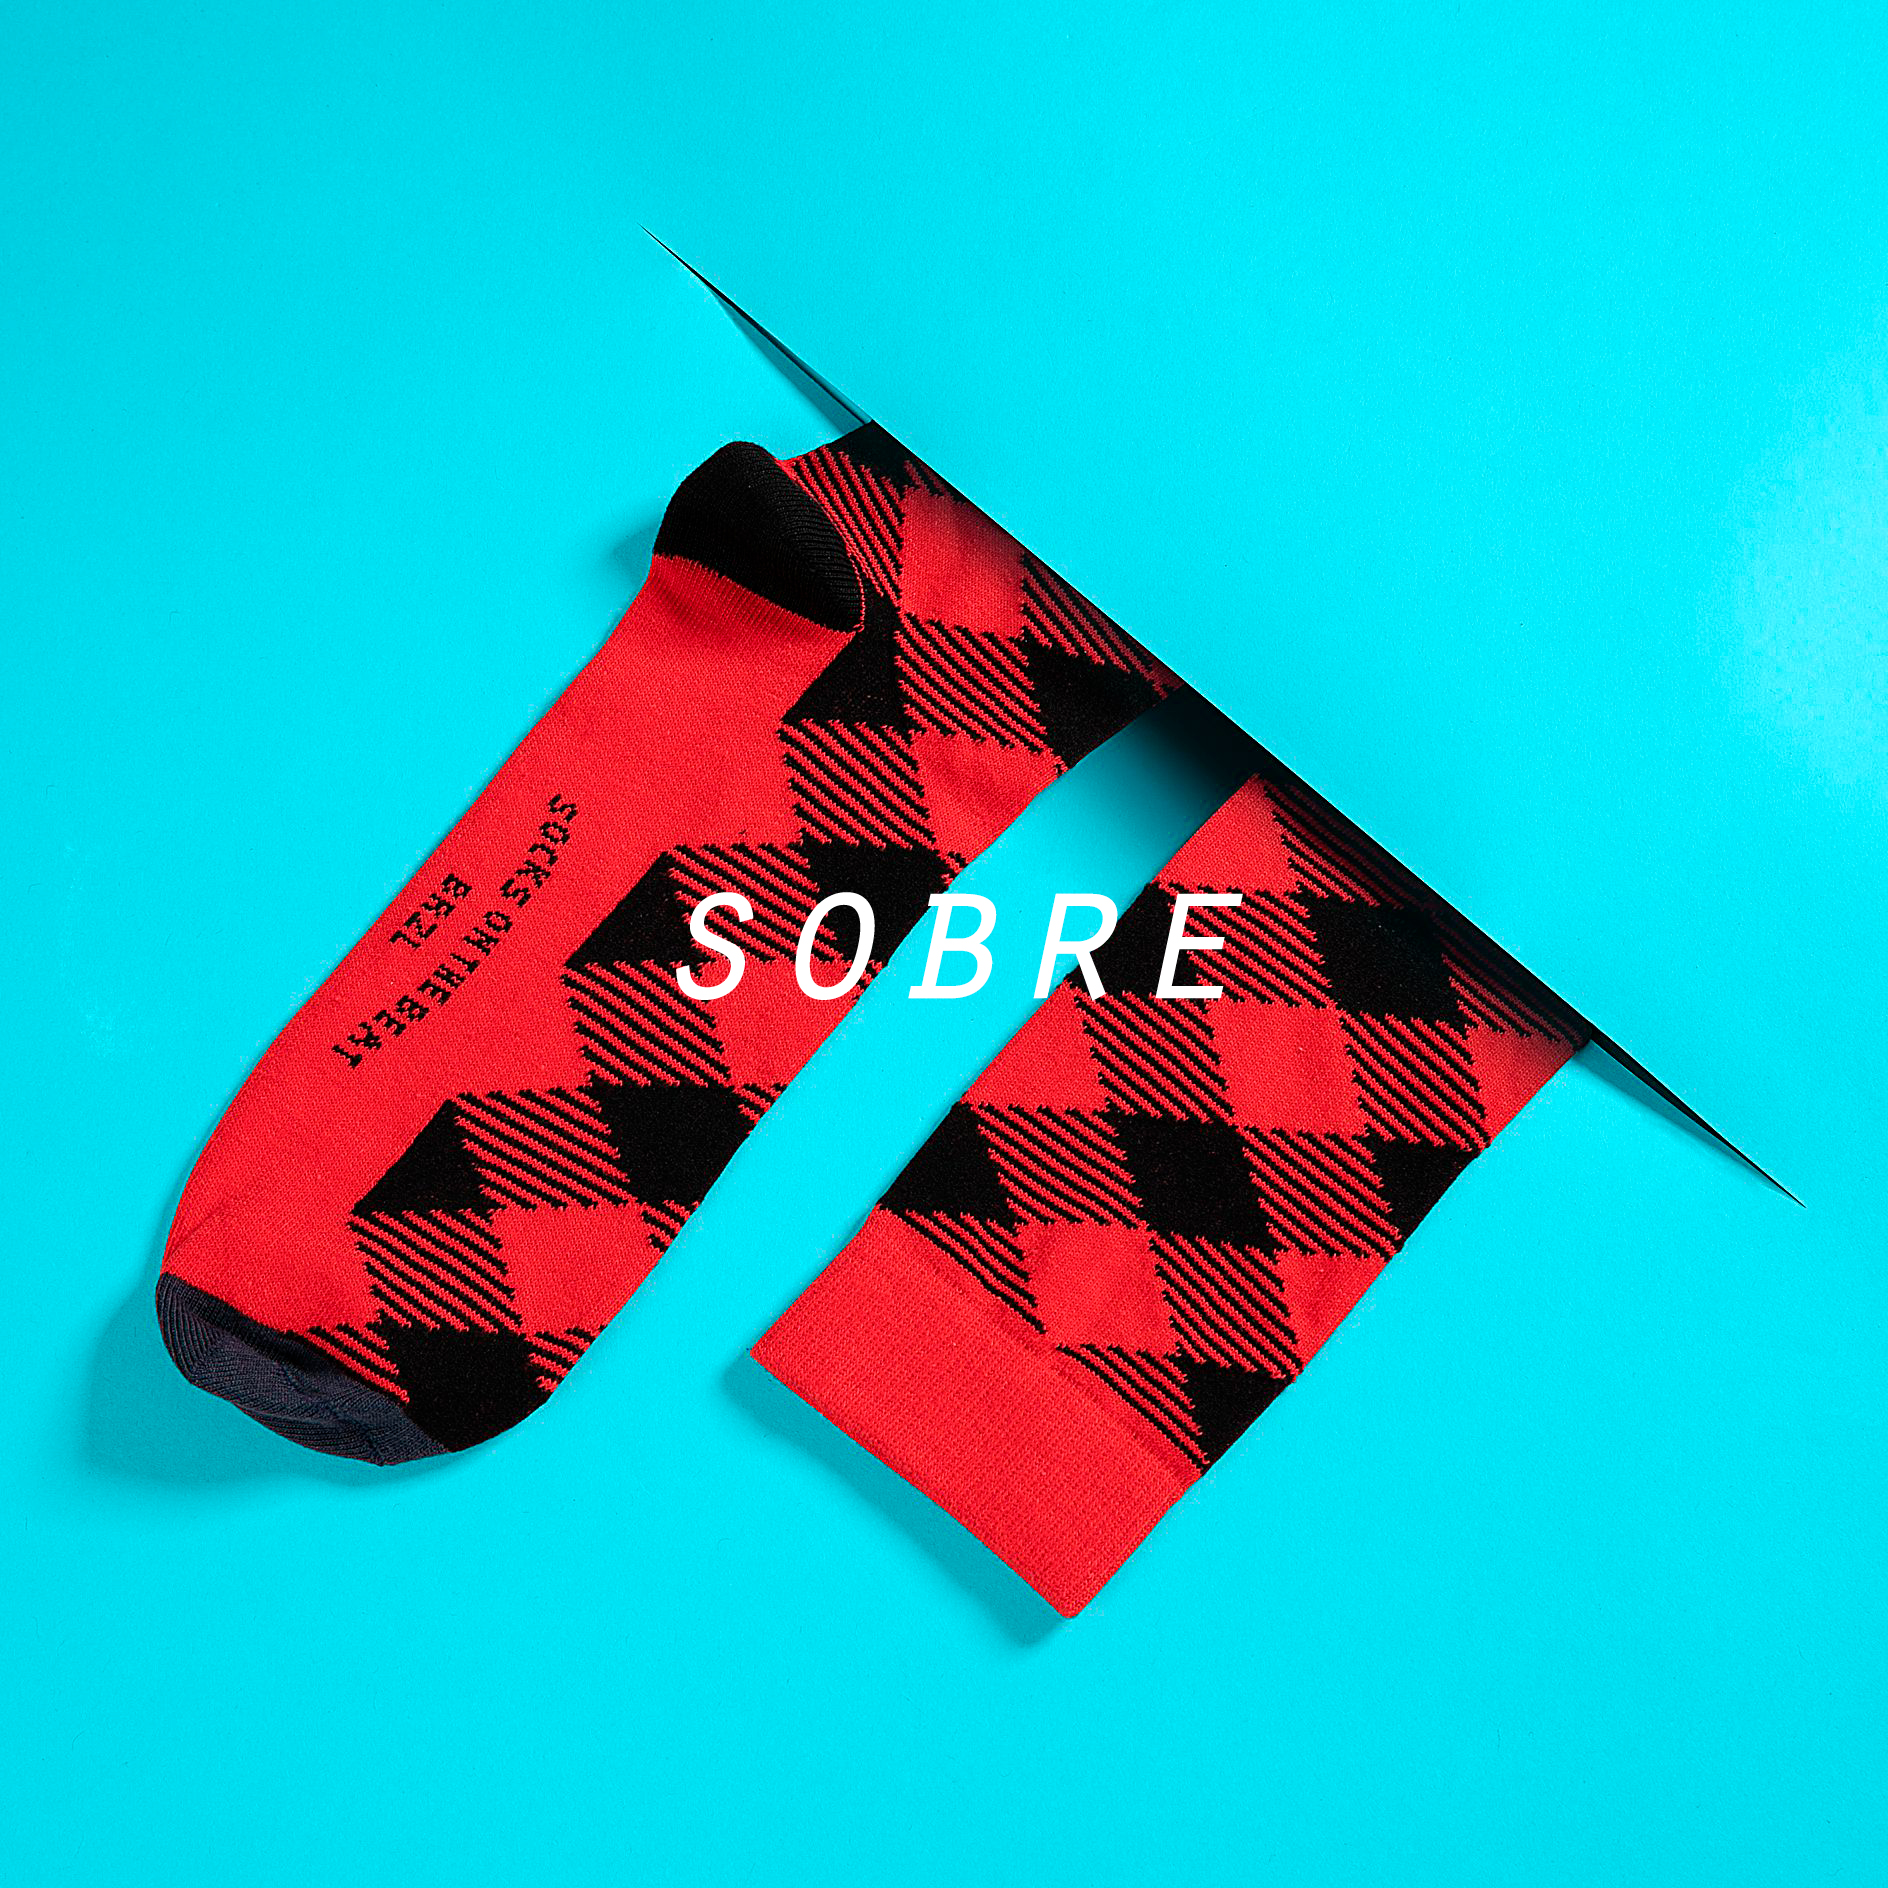 sotb_sobre-socks-on-the-beat